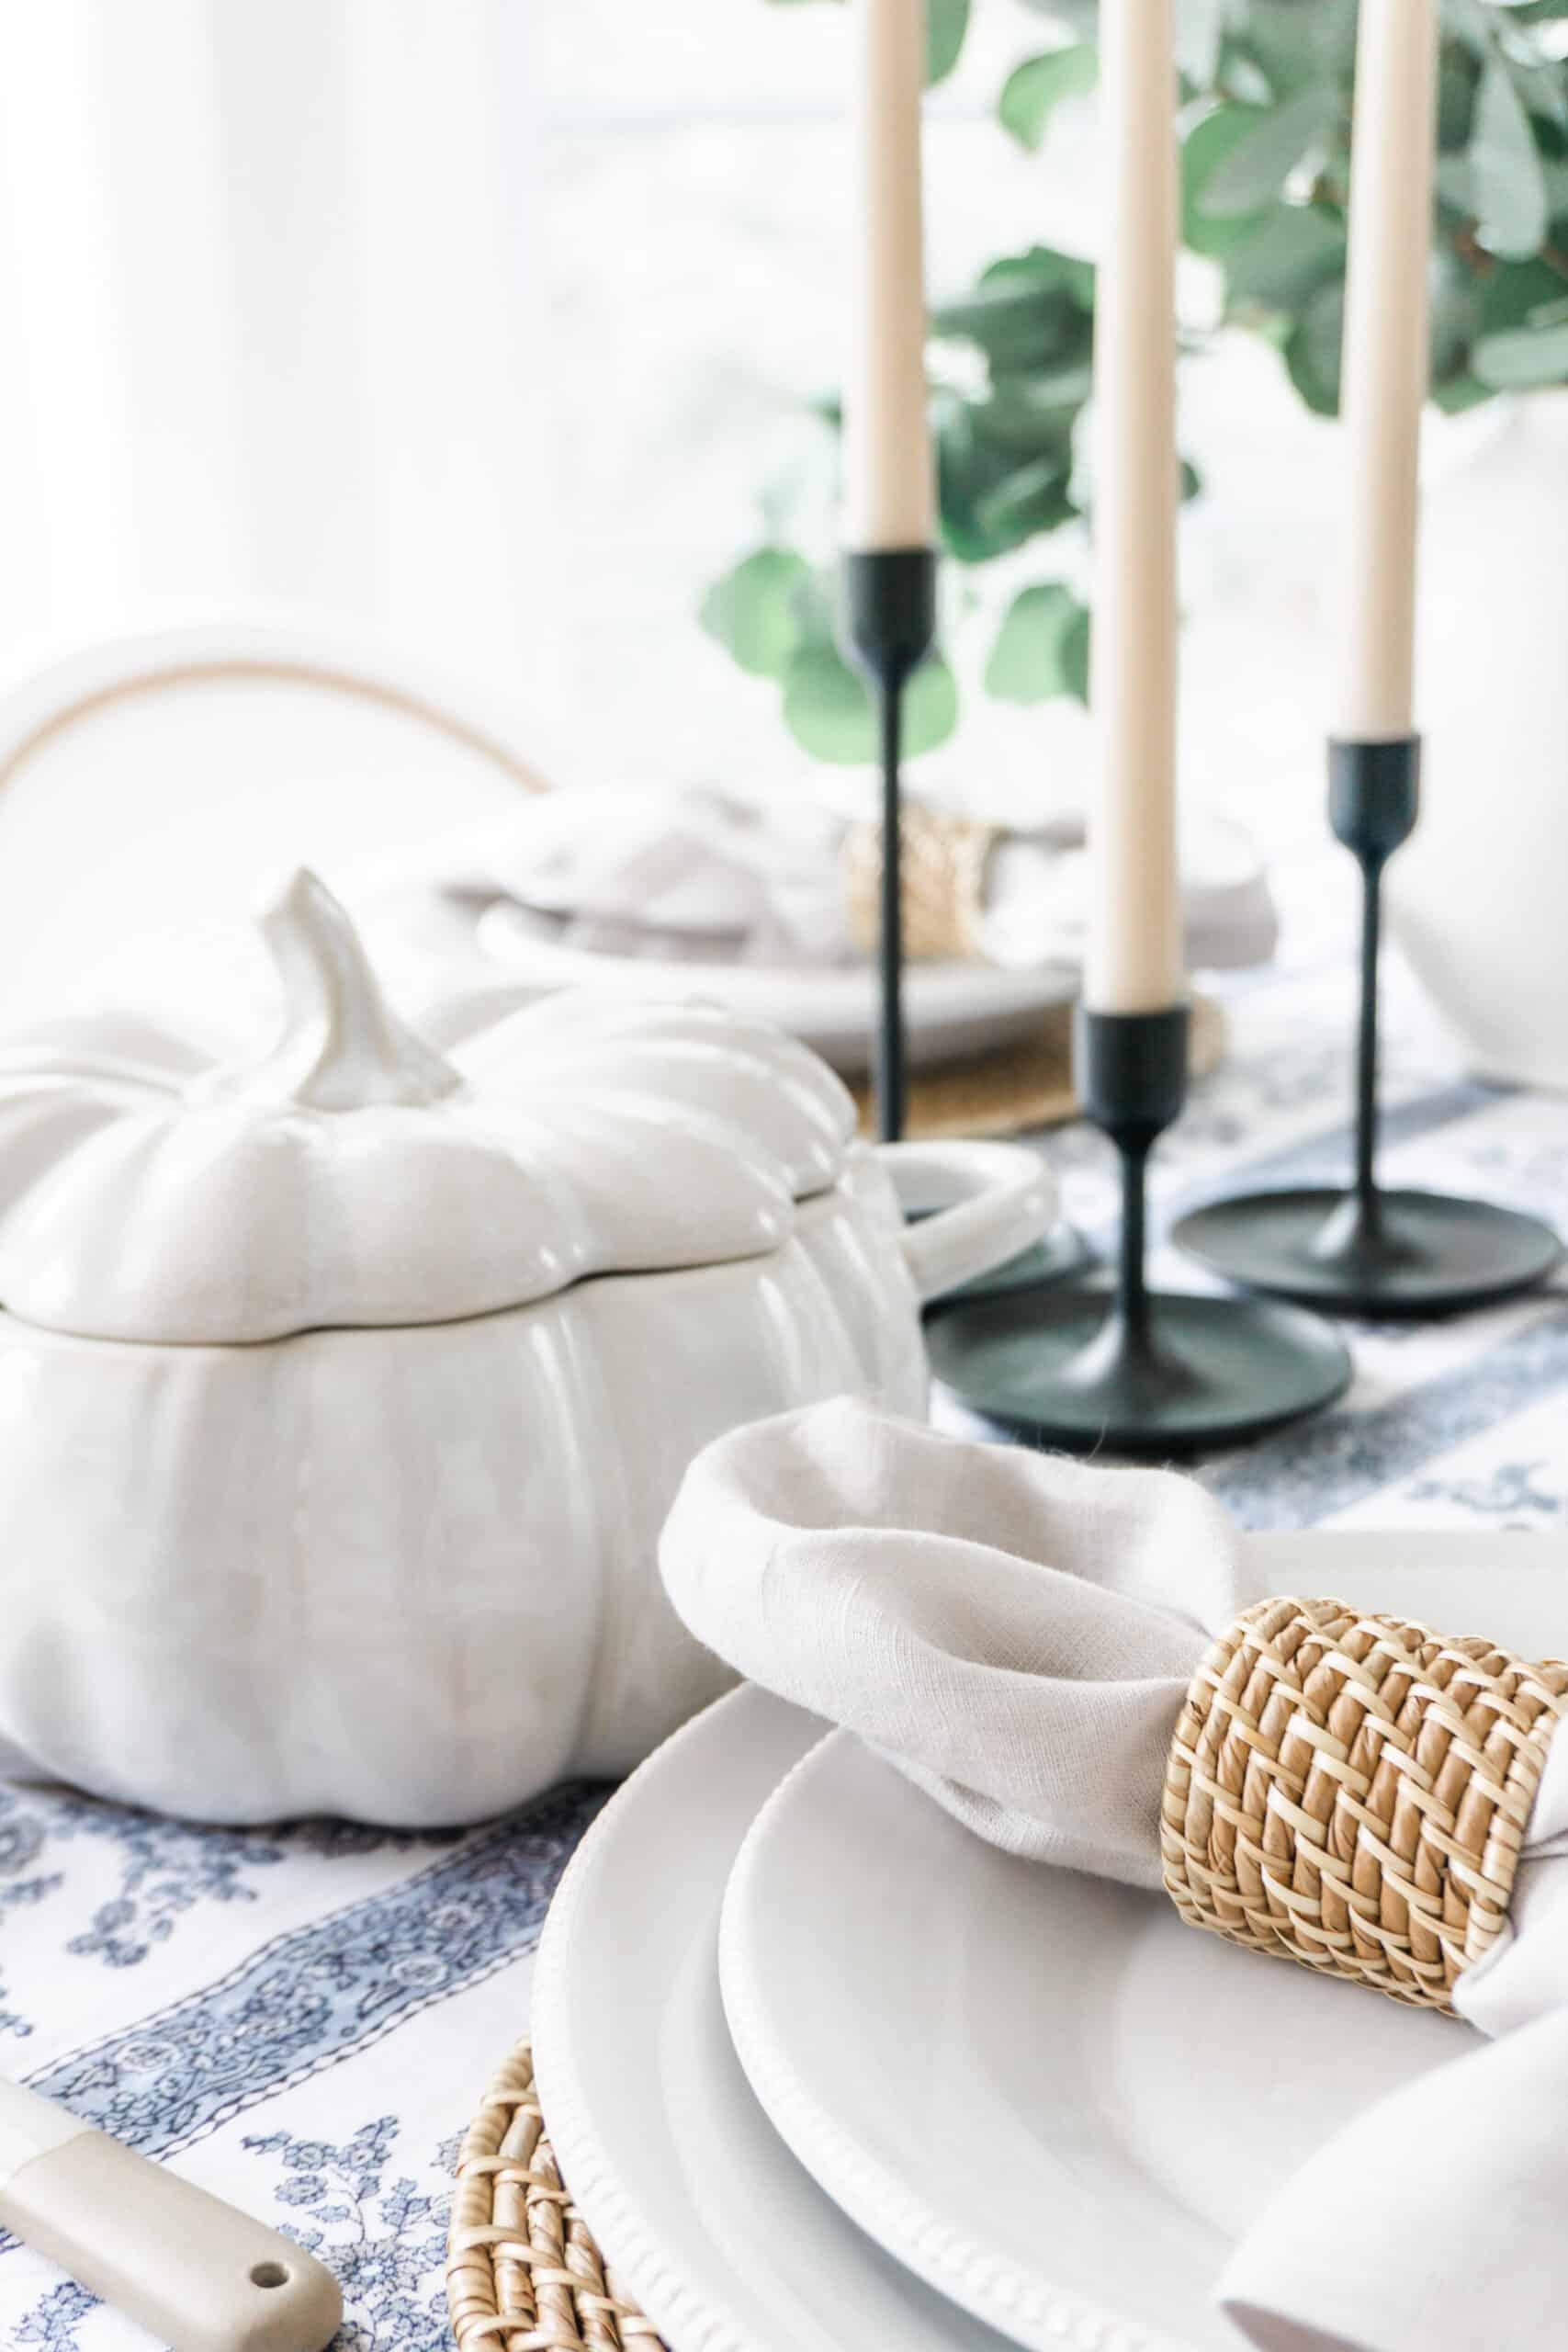 Pumpkin serving dish on table setting.